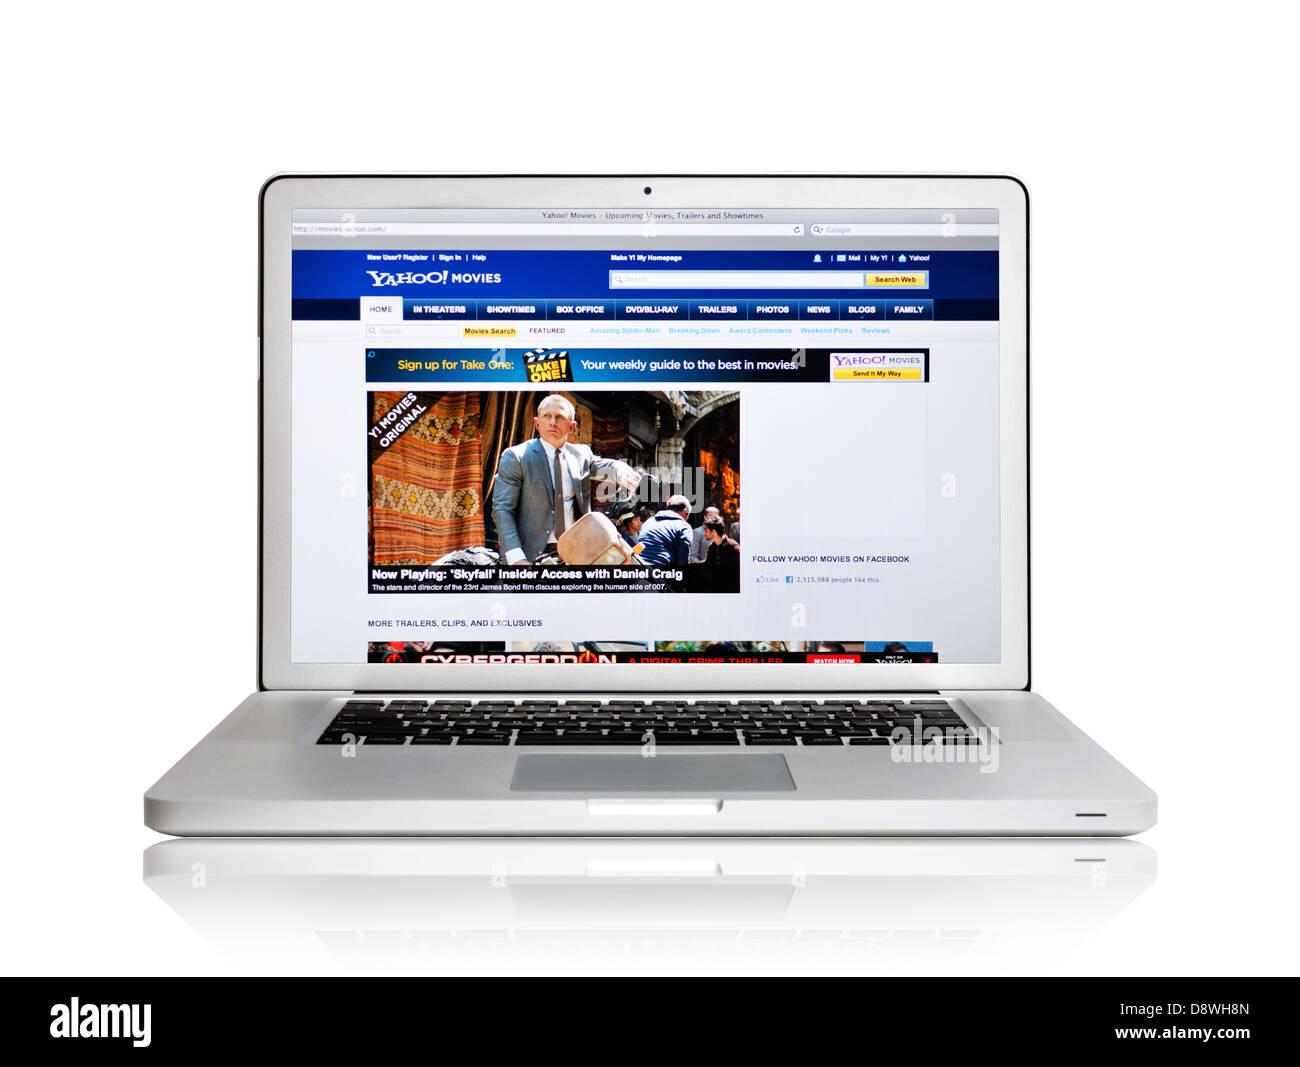 Yahoo movies website on laptop screen - Stock Image